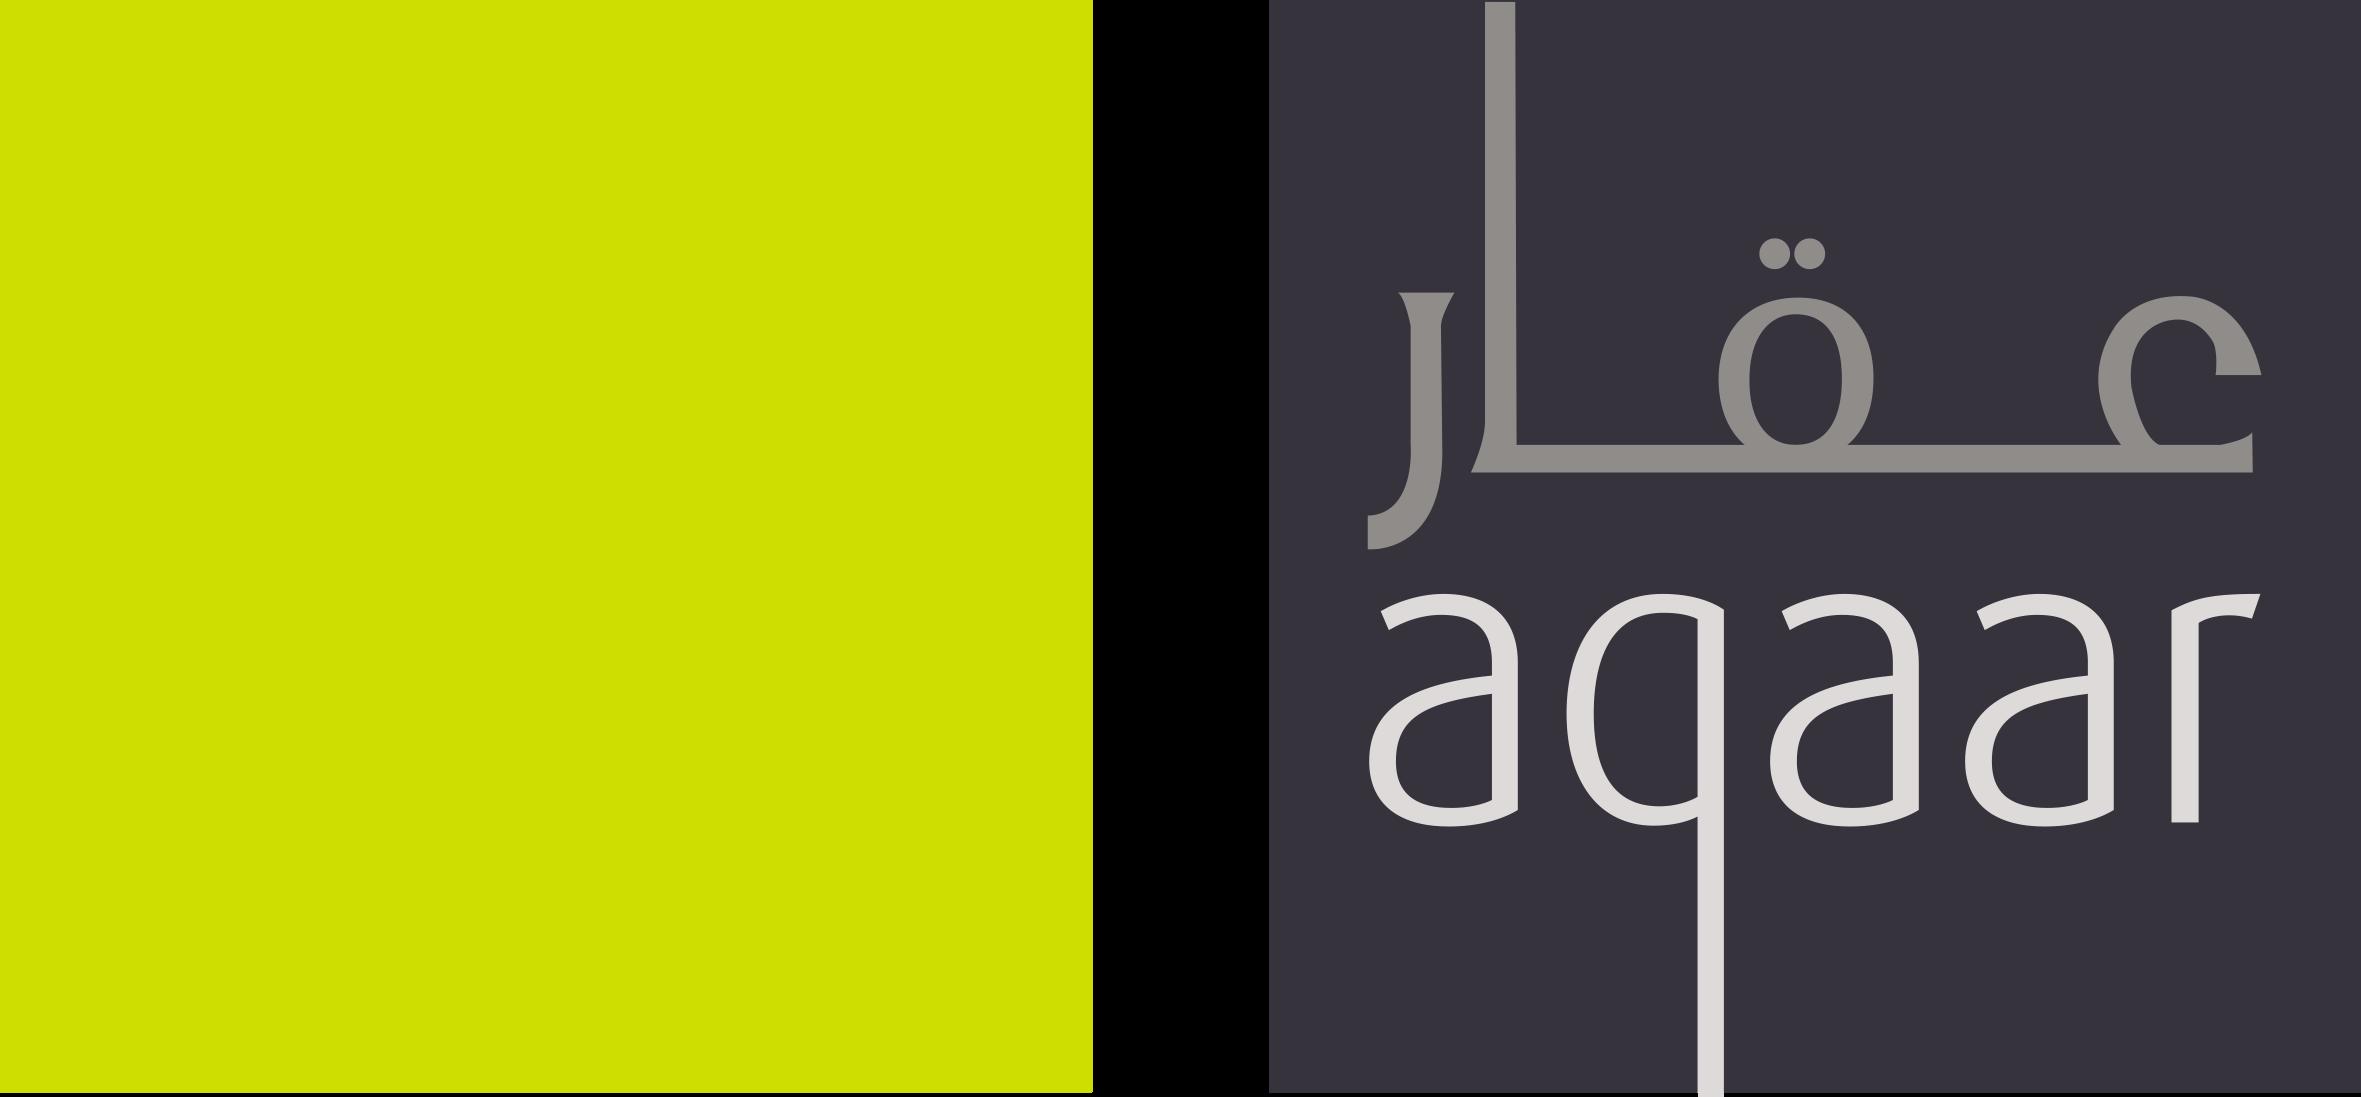 aqaar_logo_png.png